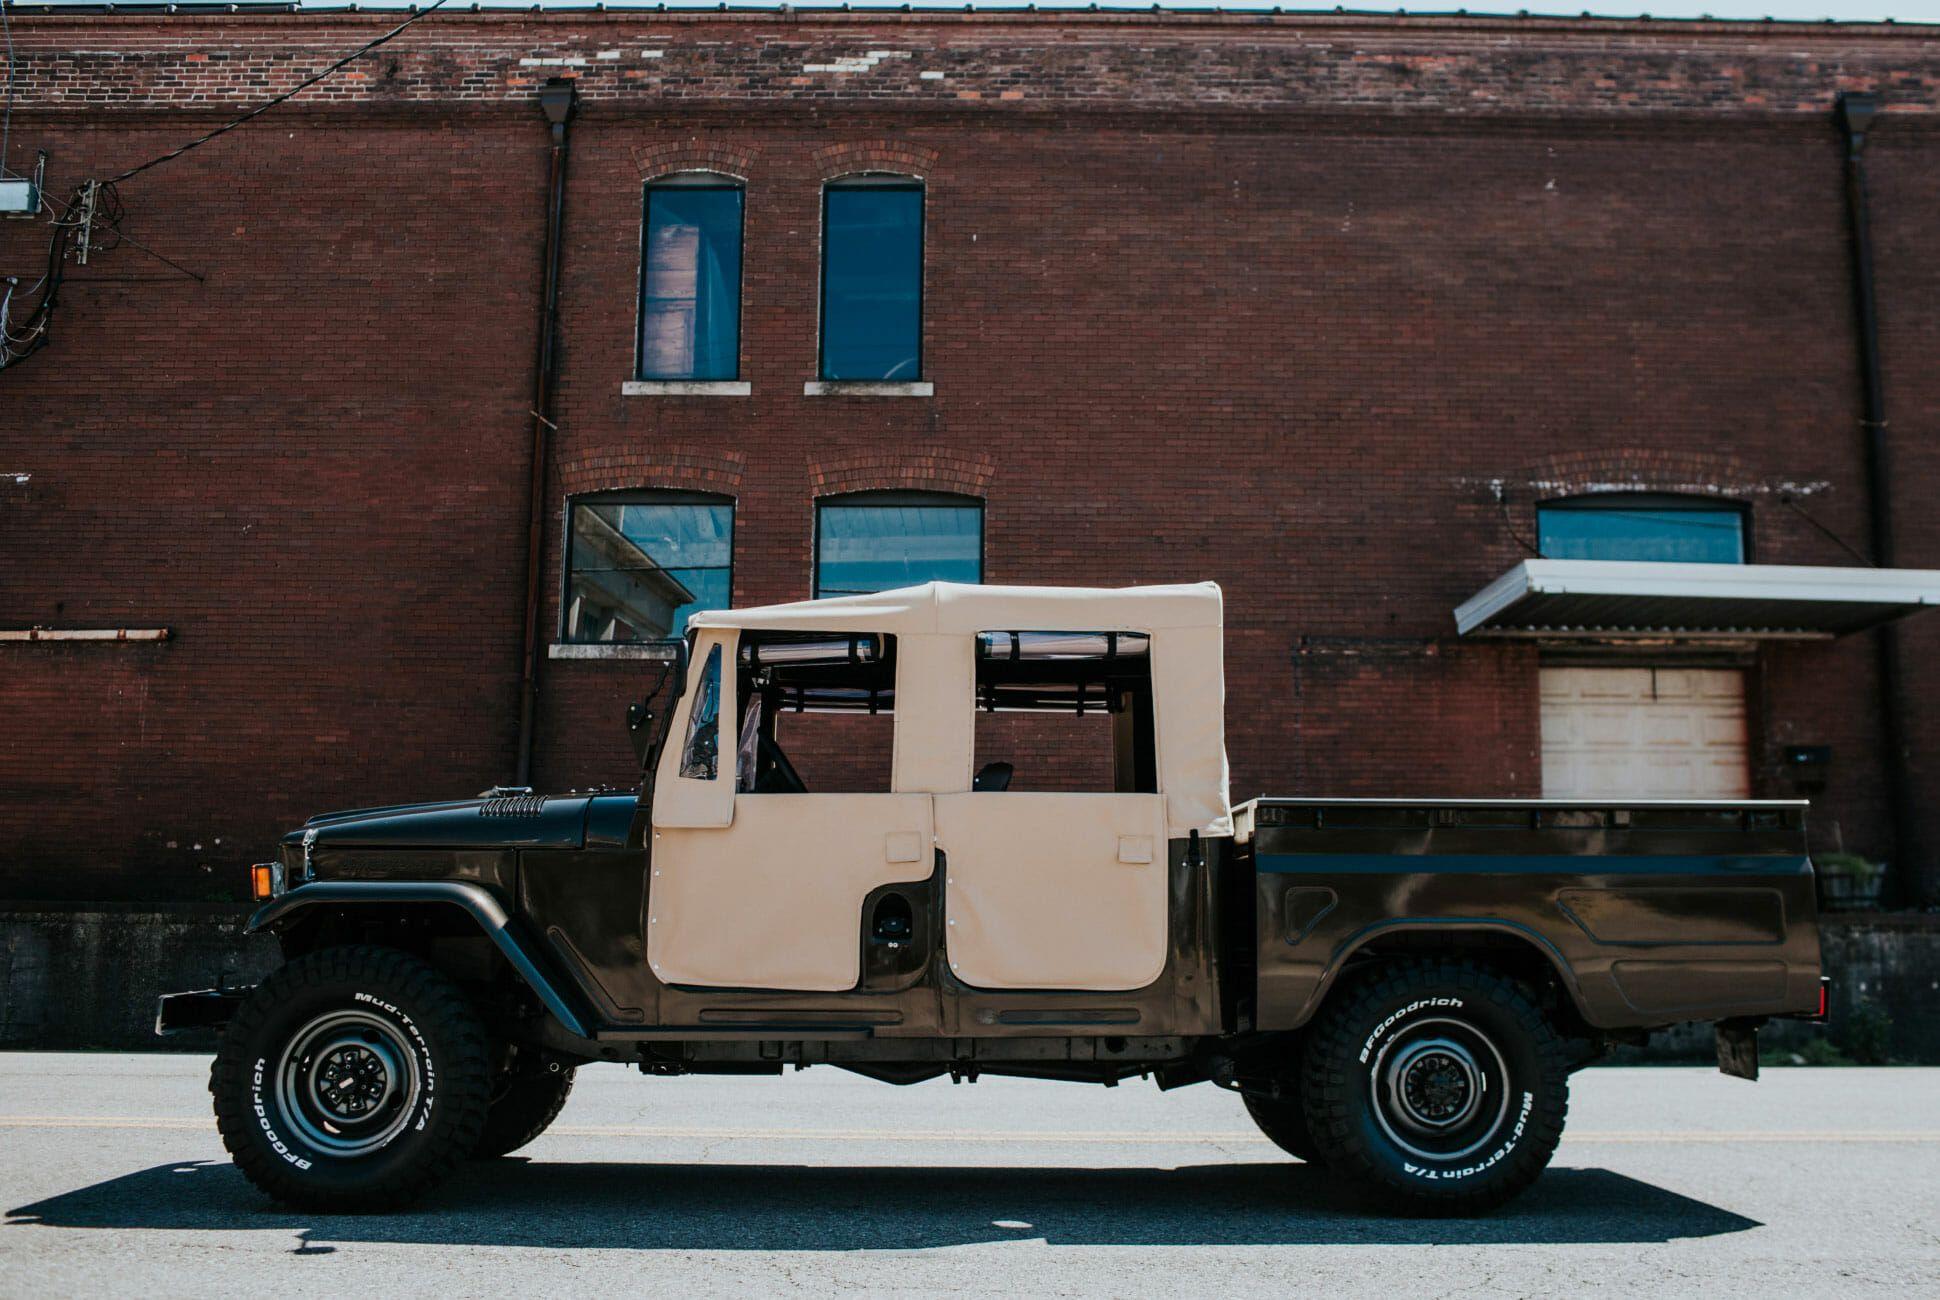 Toyota-Bandeirante-OJ55-gear-patrol-slide-08